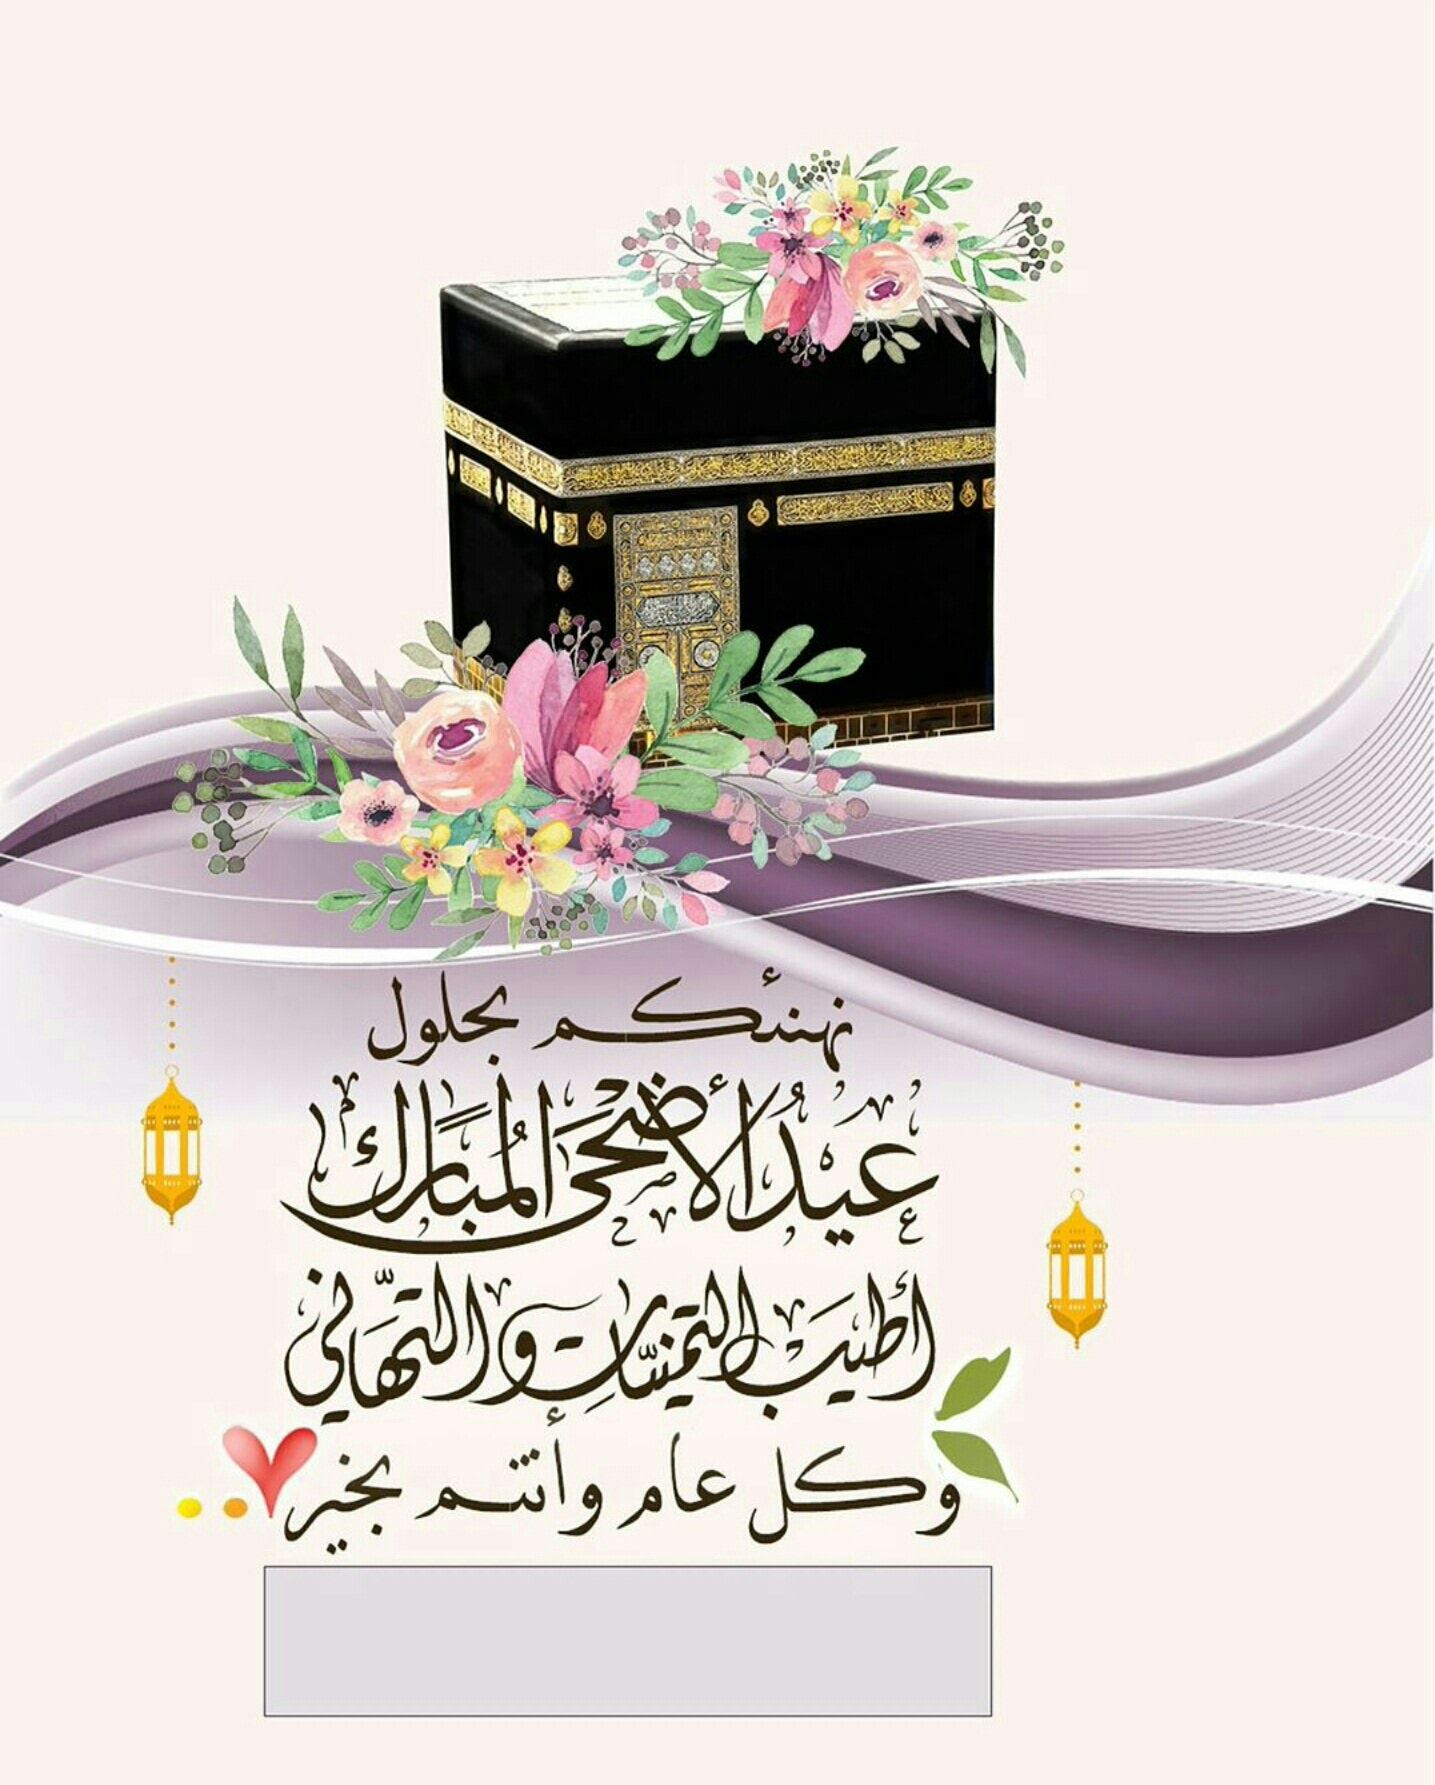 Pin By Anees Bux On عيد الفطر عيد الأضحى Eid Mubark Eid Greetings Eid Al Adha Greetings Eid Cards